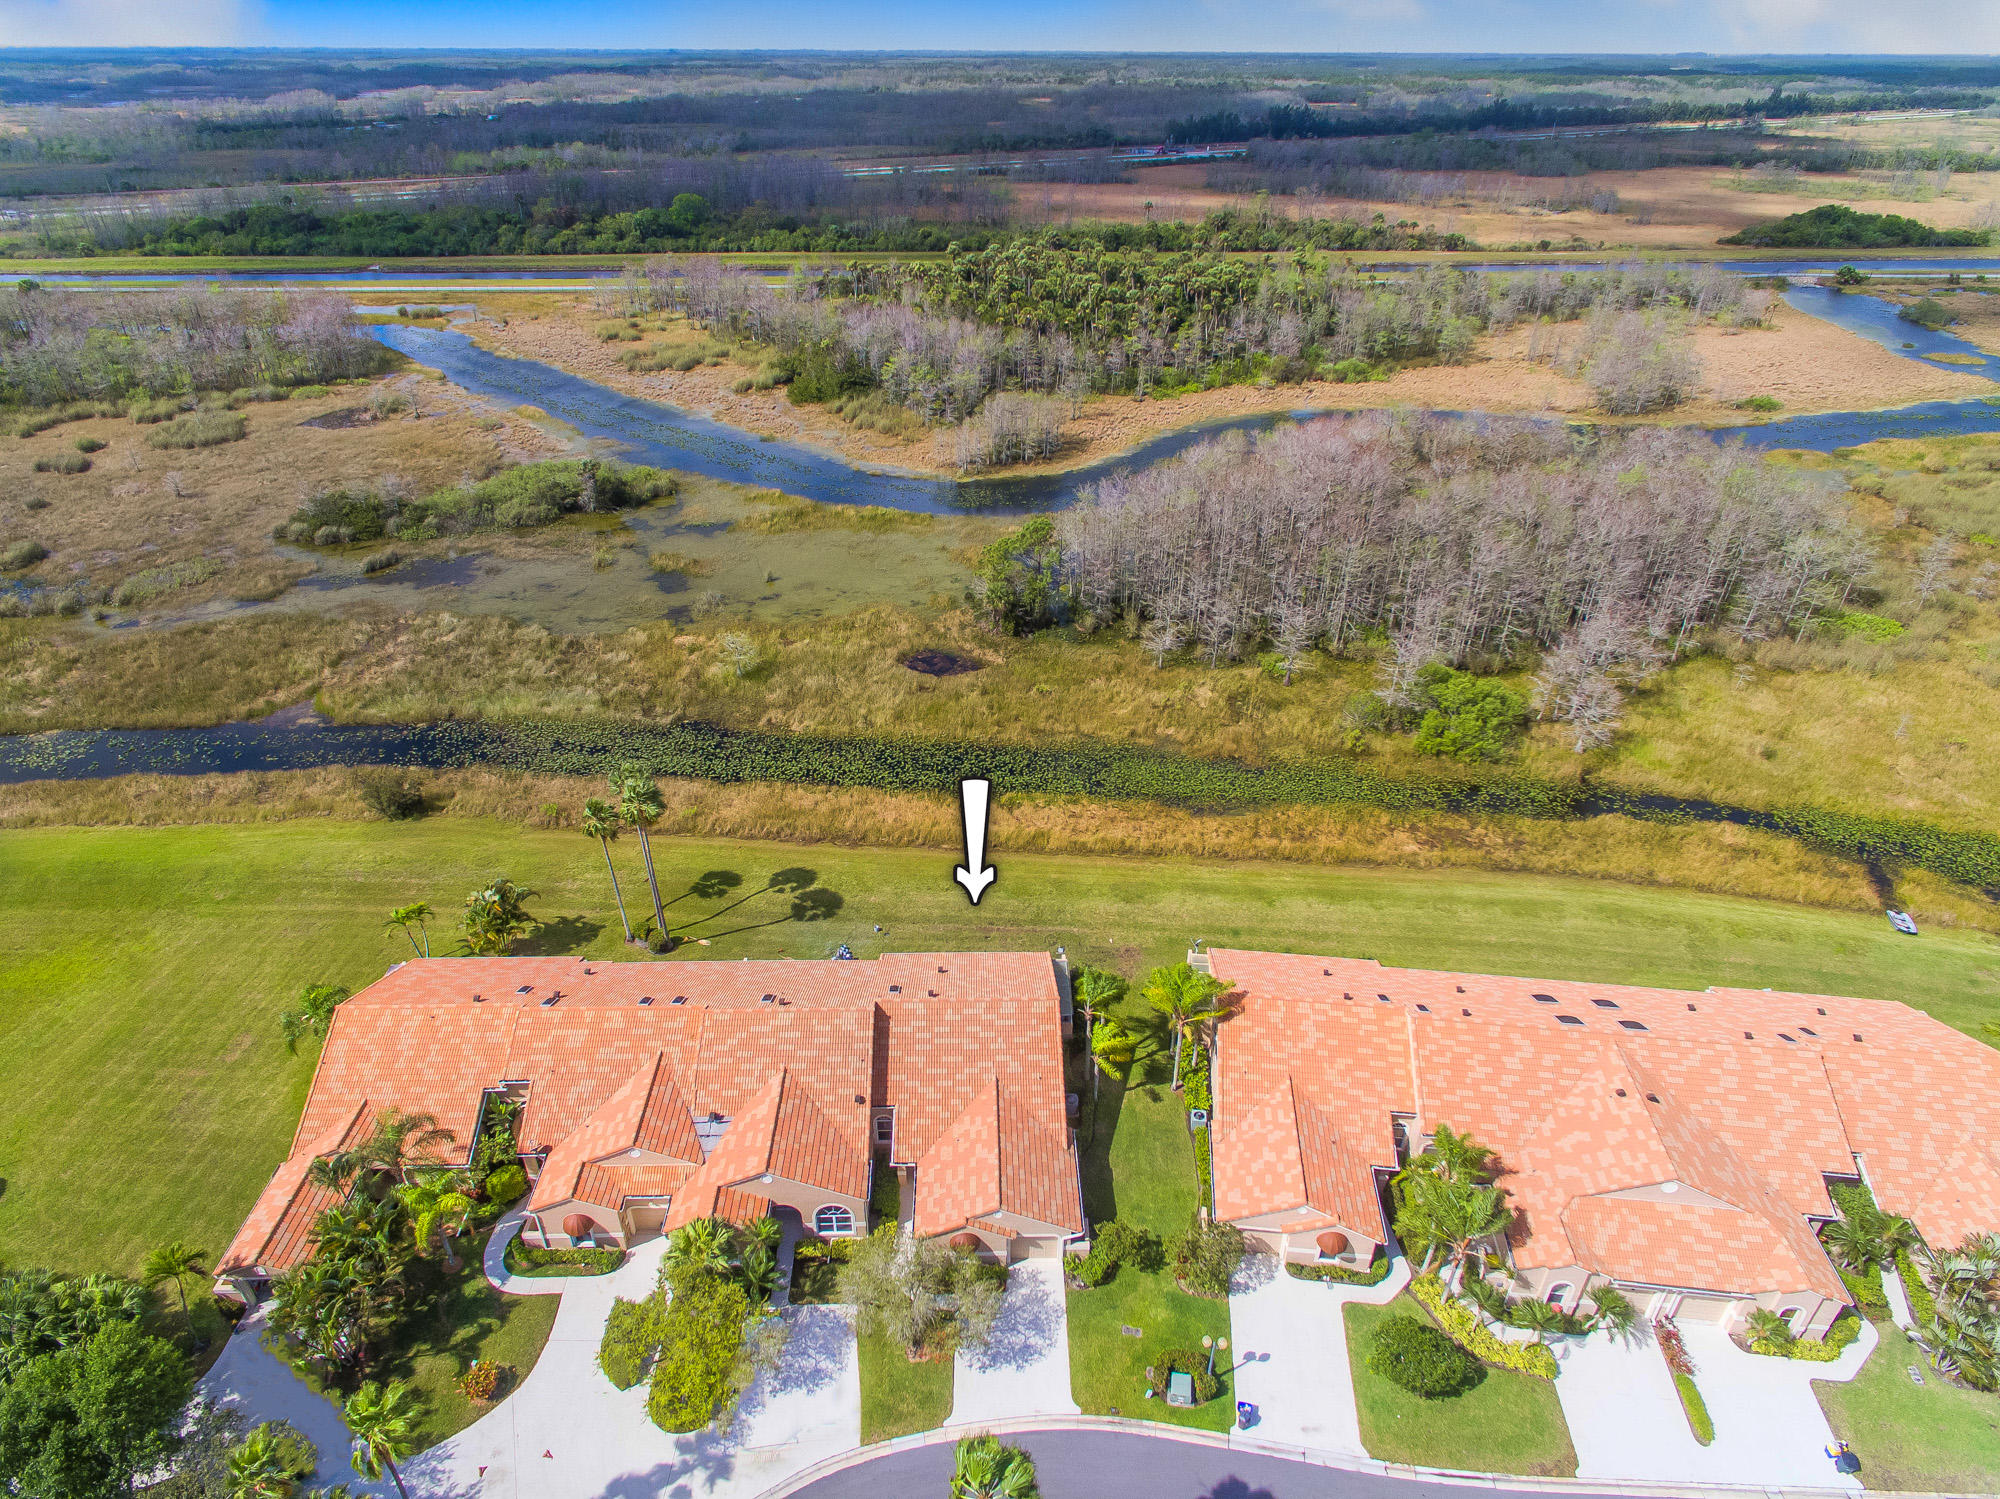 504 Sabal Palm Lane, Palm Beach Gardens, Florida 33418, 3 Bedrooms Bedrooms, ,2 BathroomsBathrooms,A,Townhouse,Sabal Palm,RX-10607098